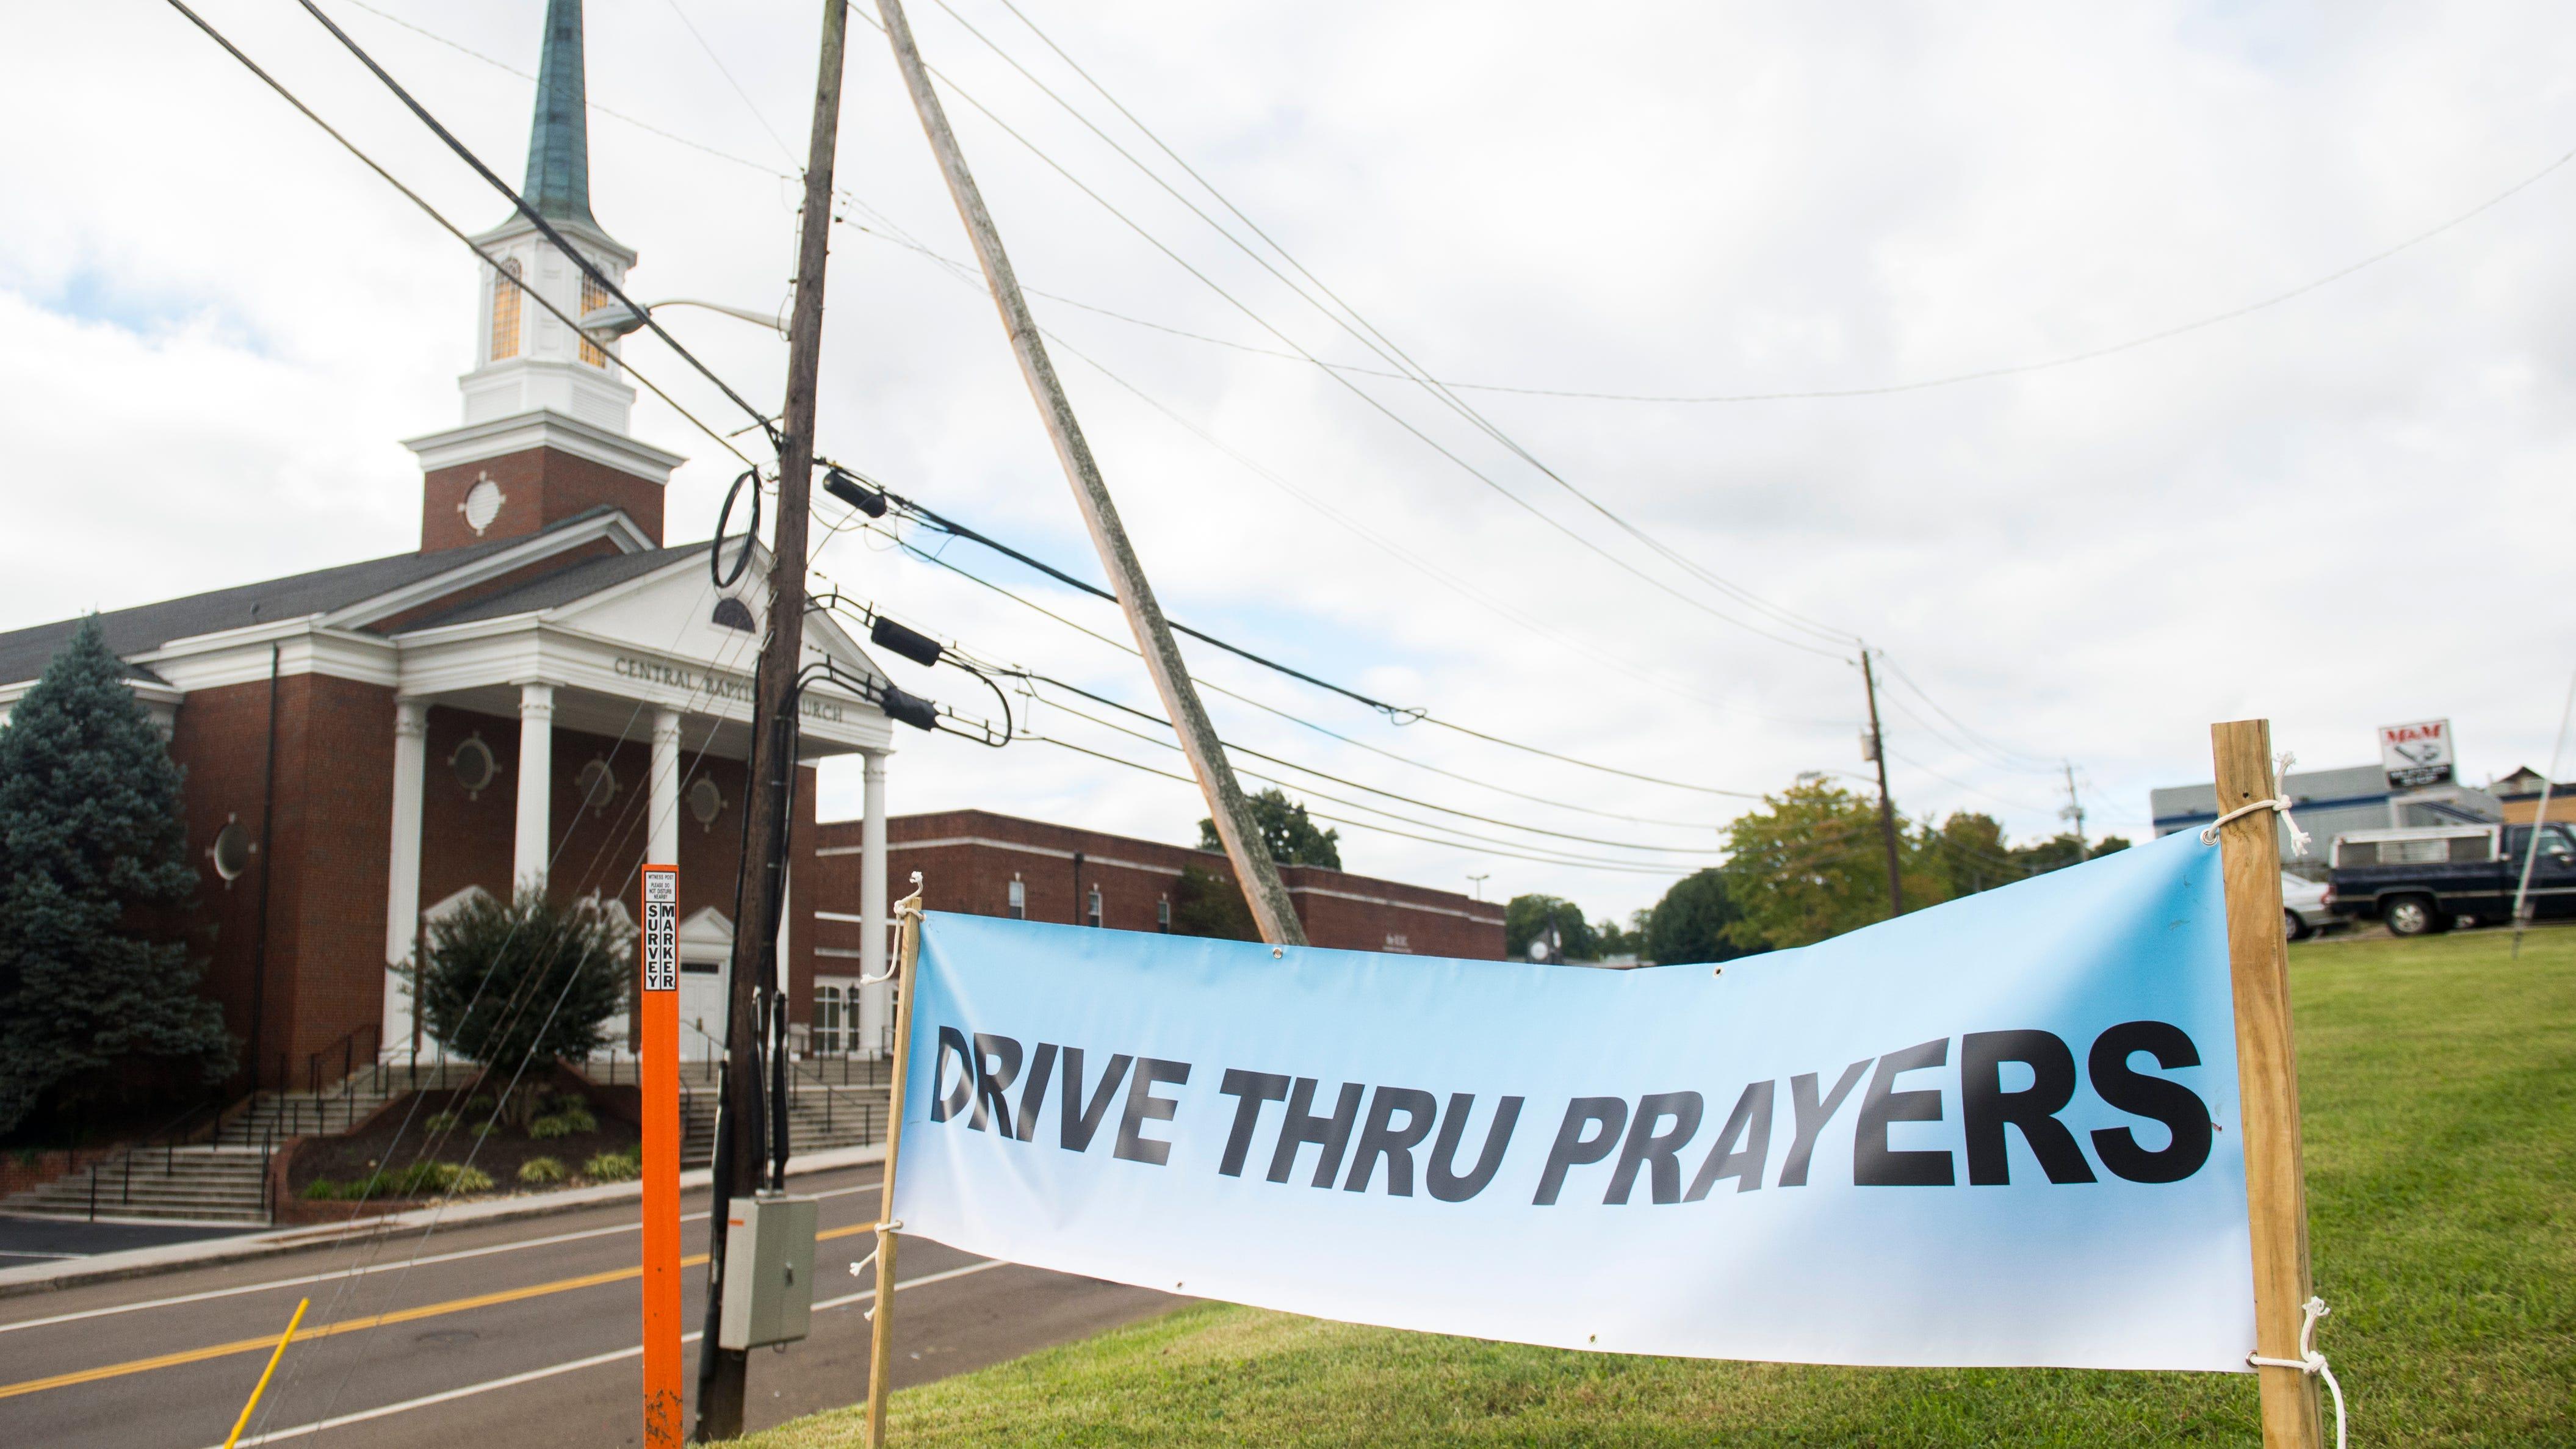 Knoxville Baptist church hosts 'drive-thru' prayer in parking lot